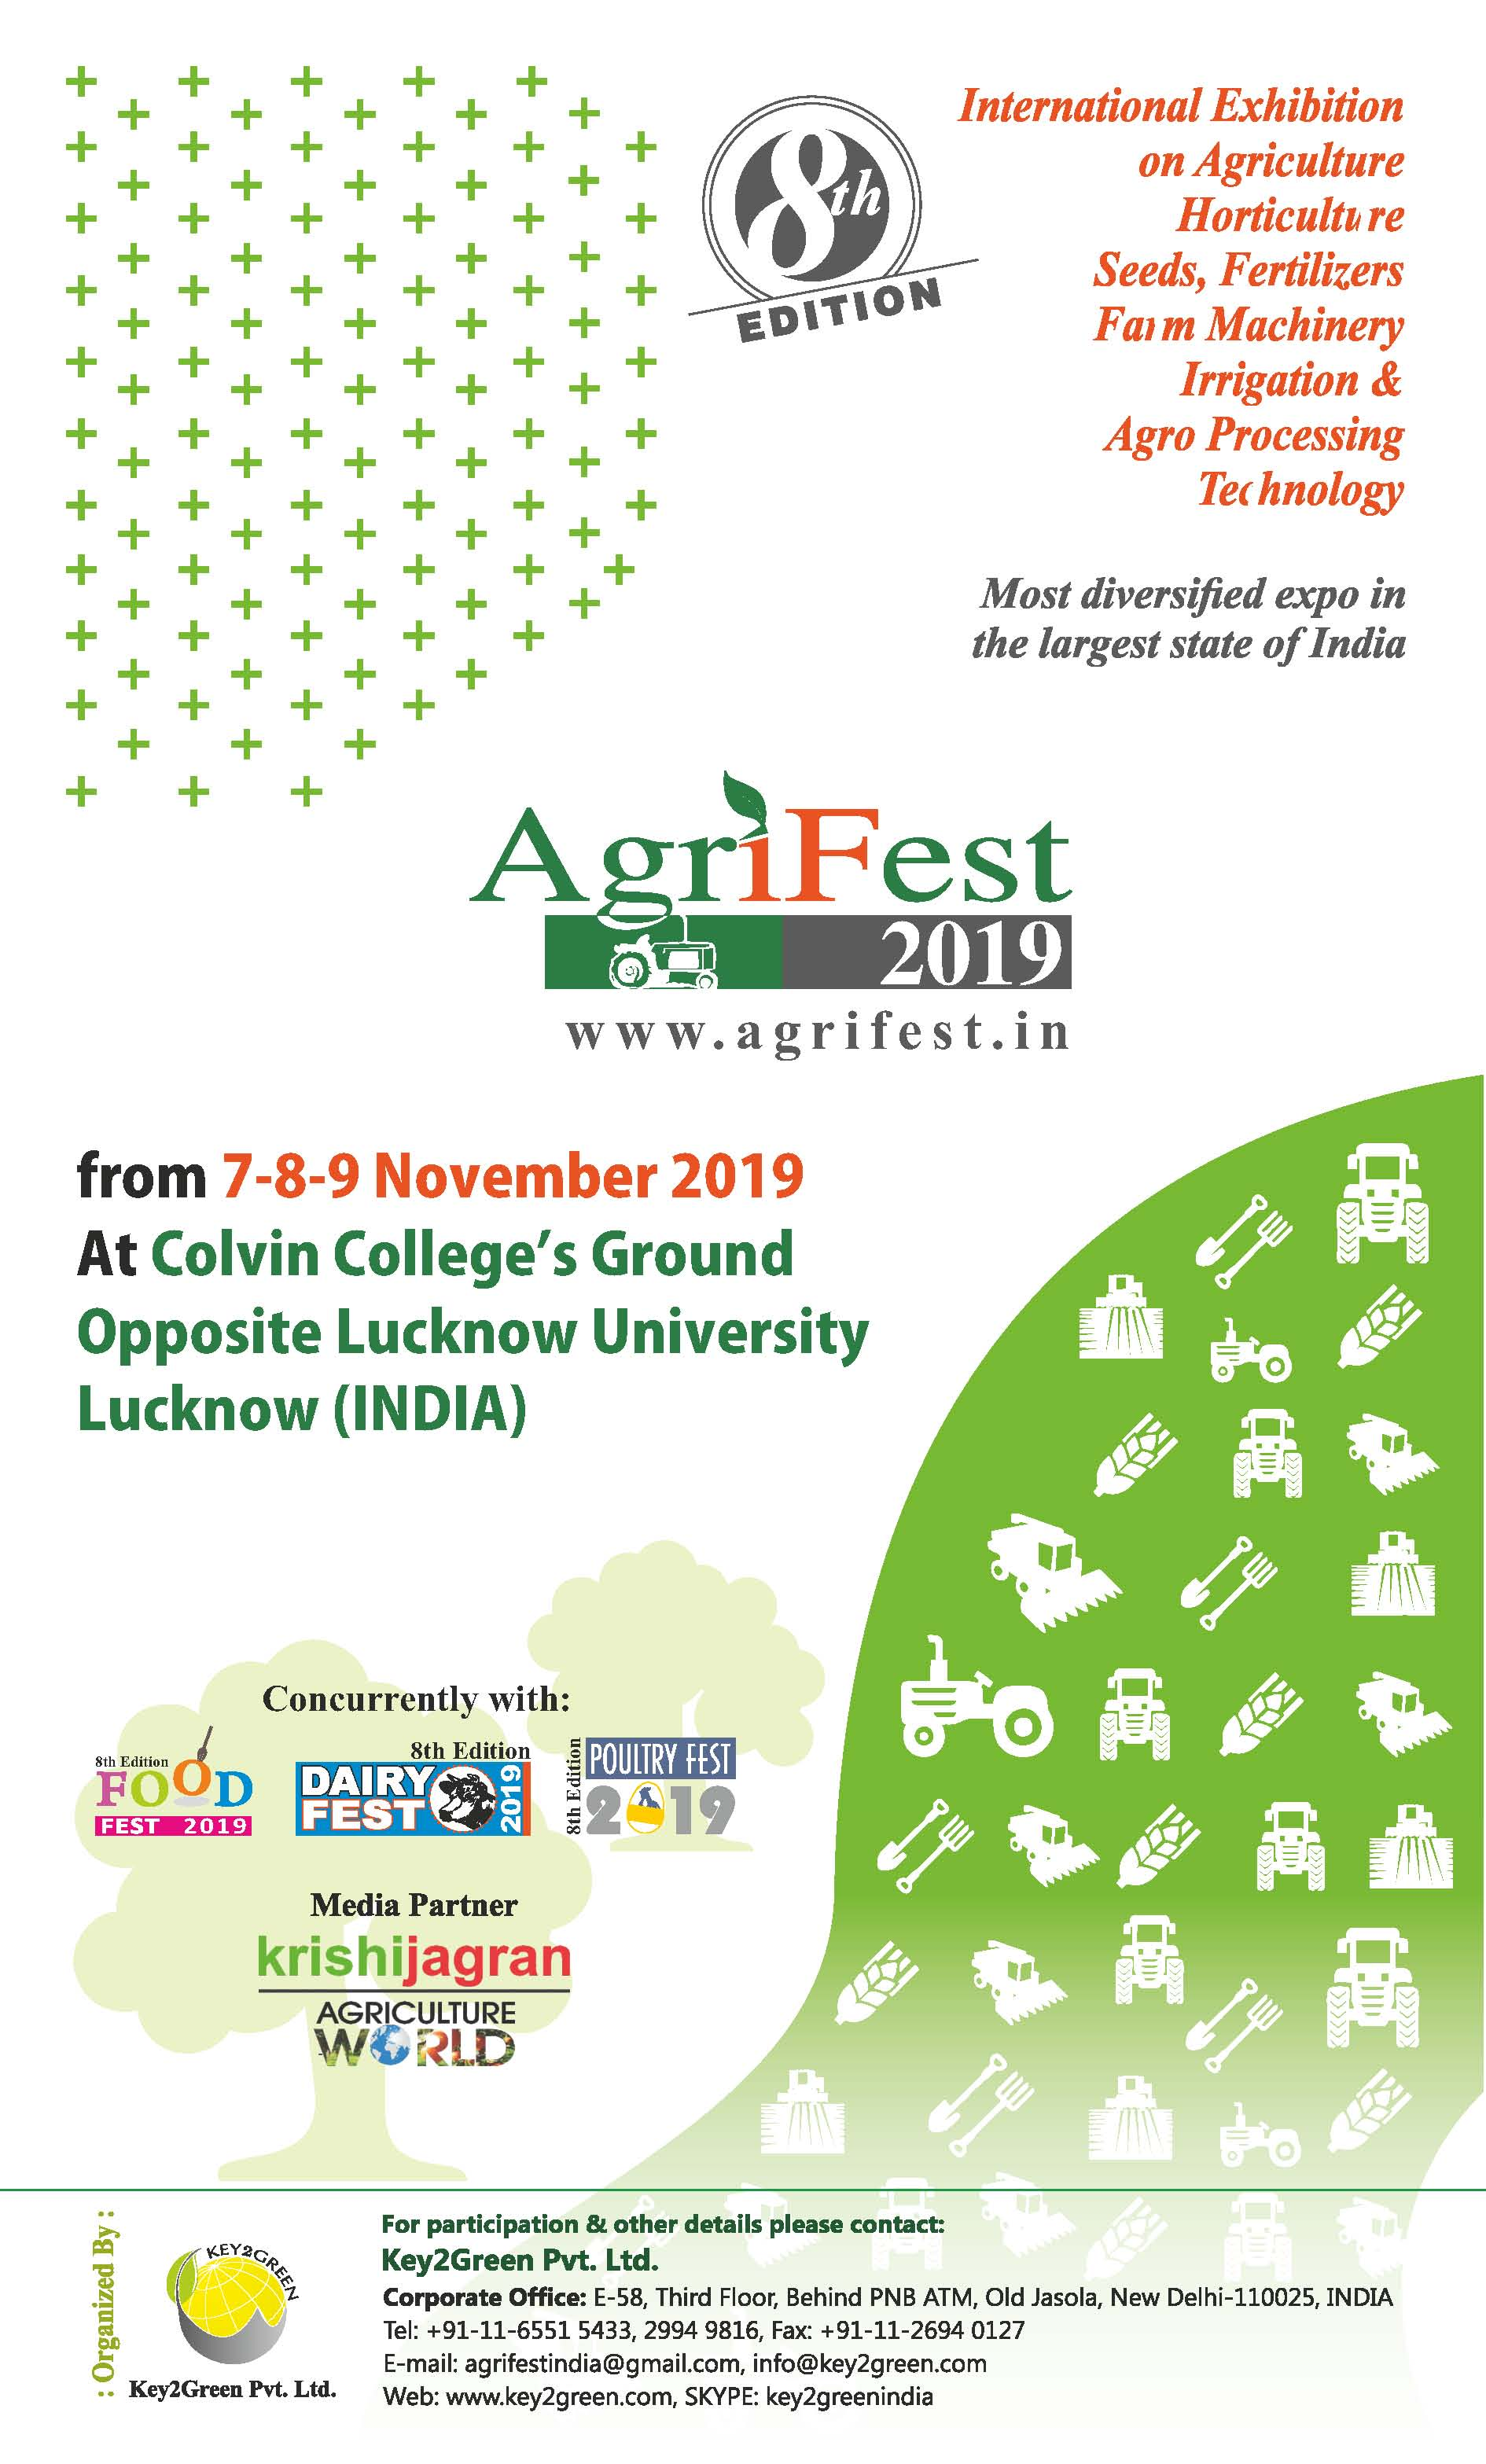 Agri fest 2019